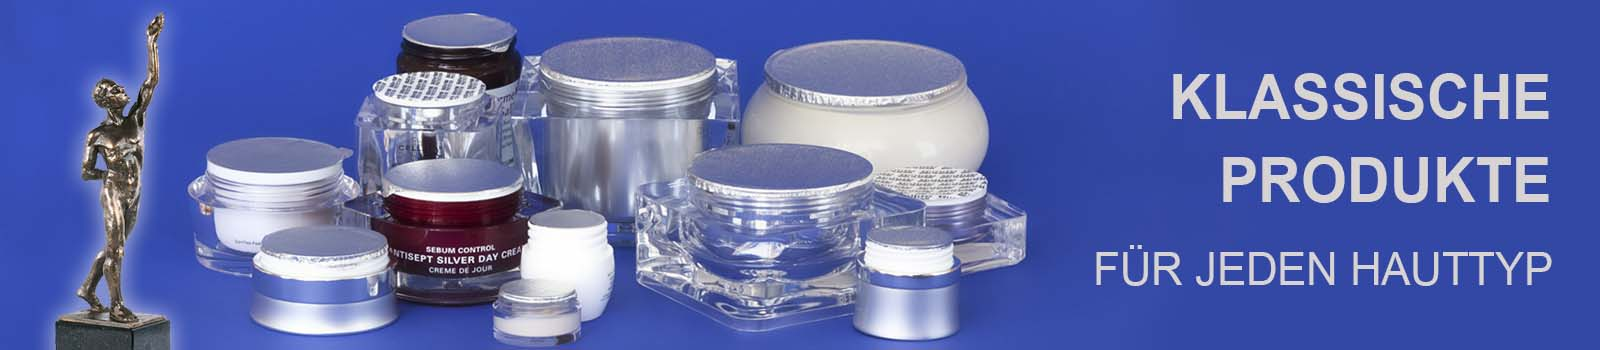 Beautyspa Servicegesellschaft mbH - Private Label - Kosmetikherstellung